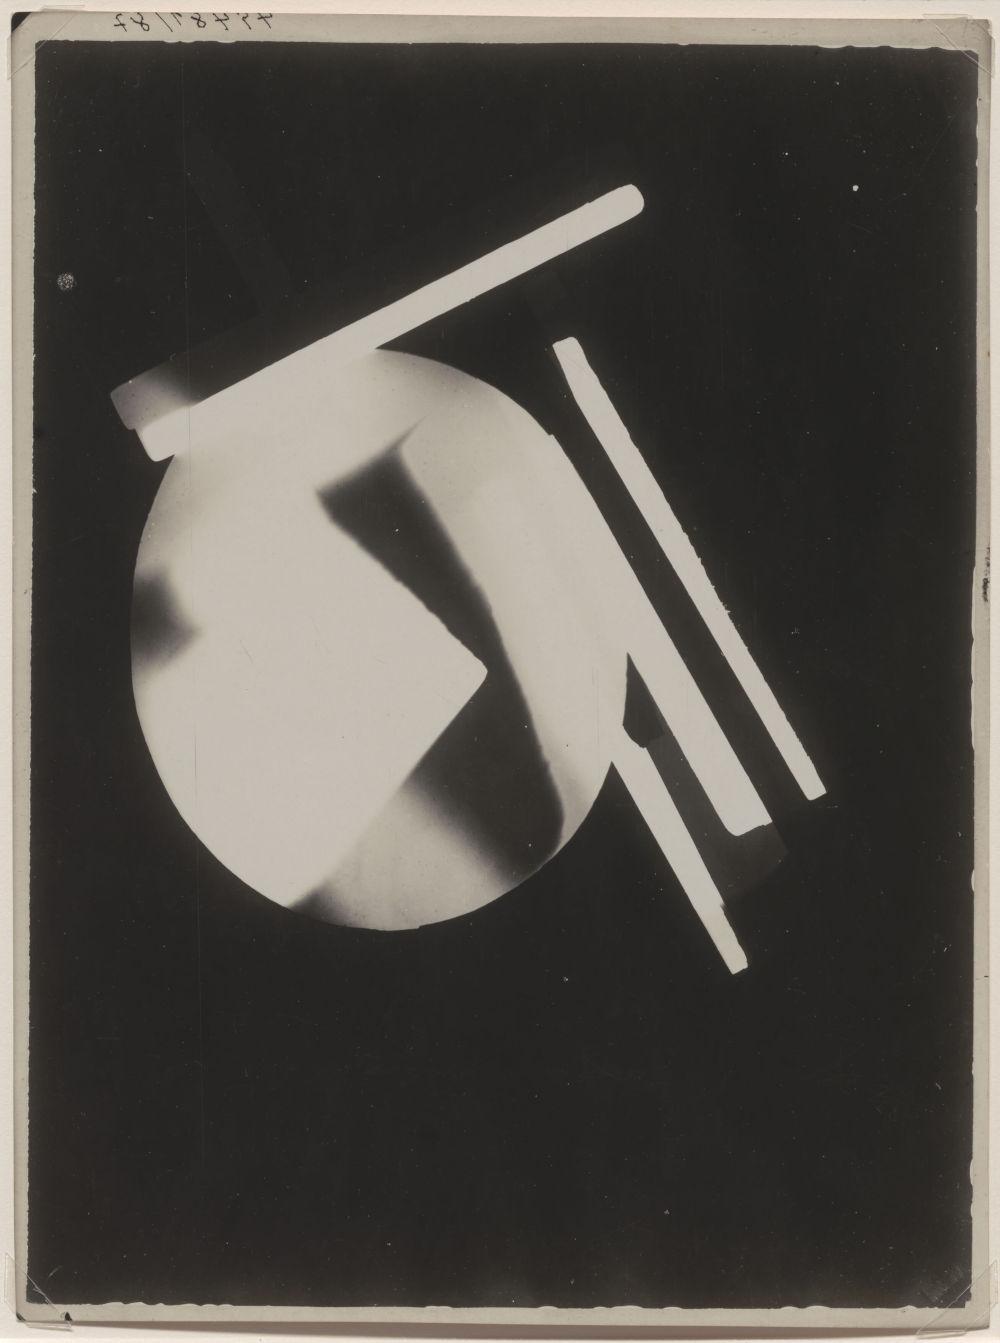 László Moholy-Nagy, Untitled (Circle angle / Positive), 1925. Photograph 17.3 x 23.2 cm / 6 3/4 x 9 1/8 in © the Estate of László Moholy-Nagy / Artists Rights Society (ARS), New York / VG Bild-Kunst, Bonn. Courtesy of the Estate of László Moholy-Nagy